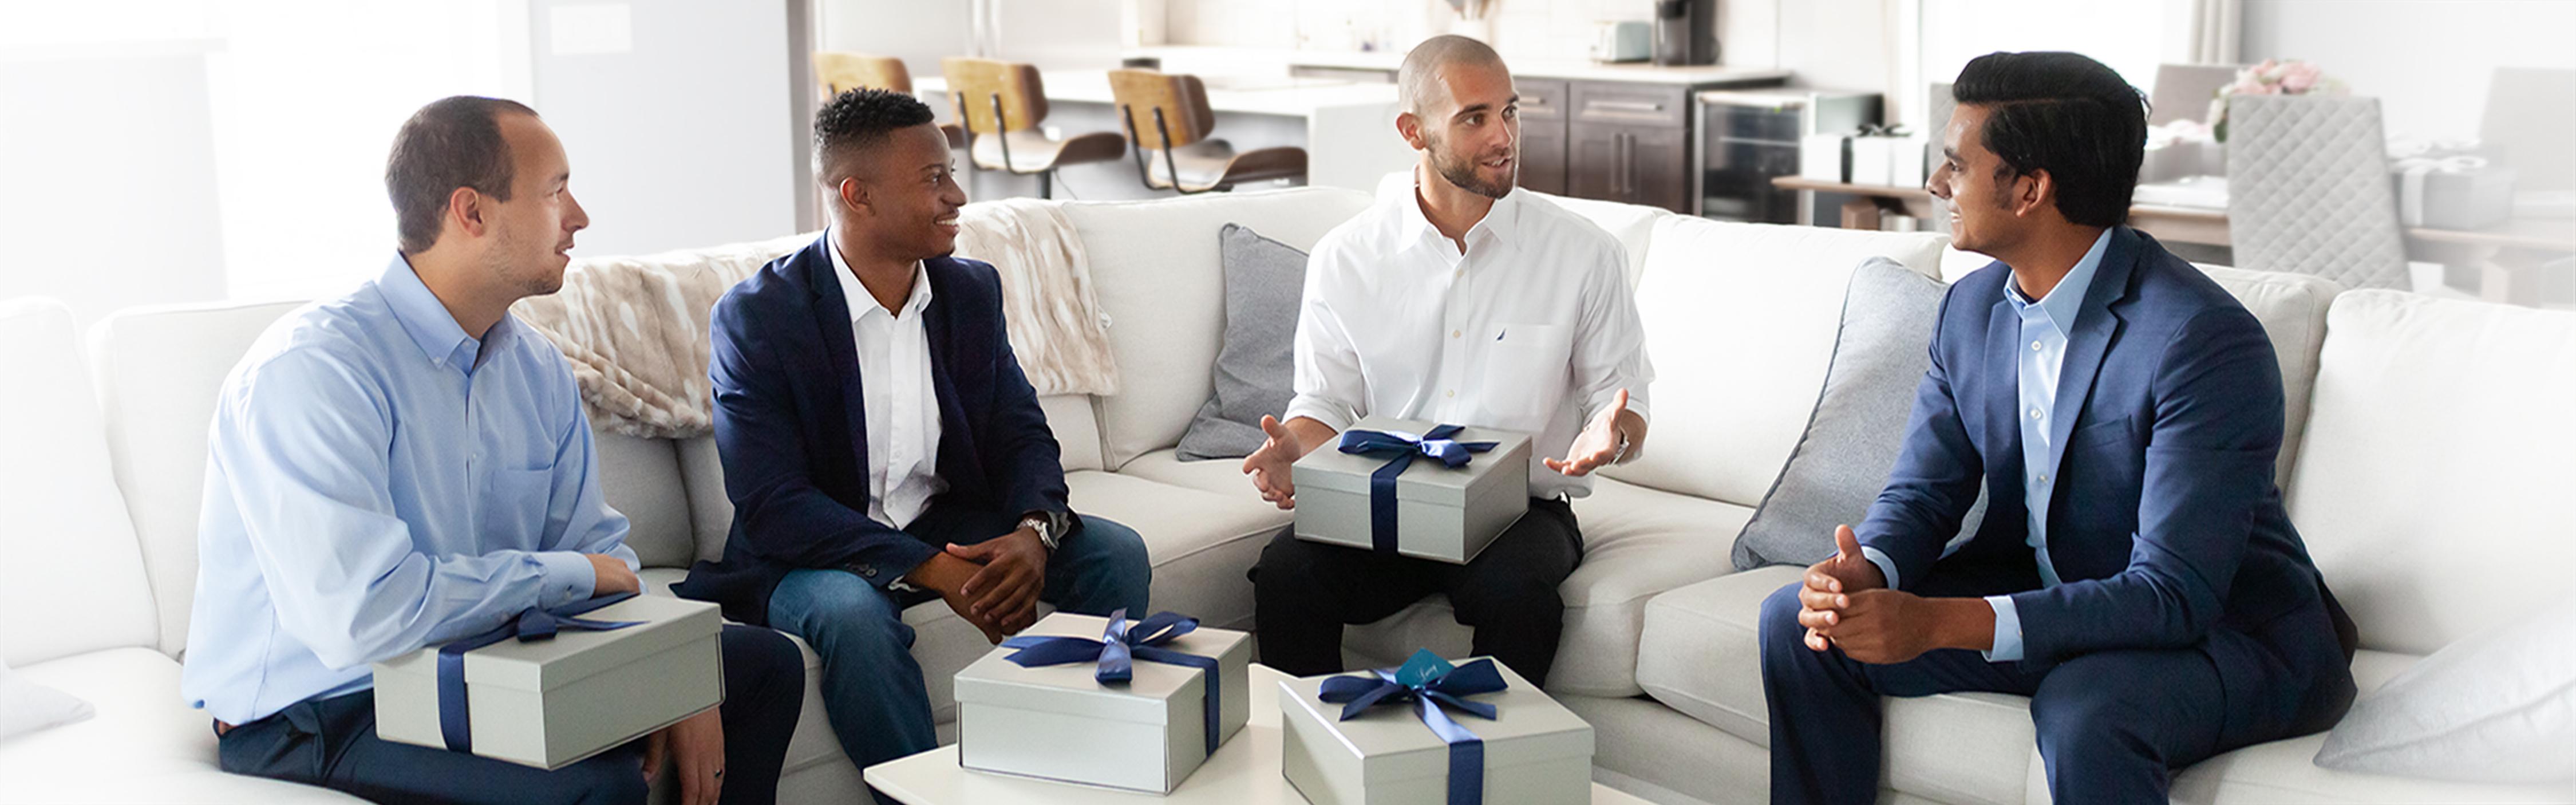 Gift Box For Men - Grateful Gadgets Ban